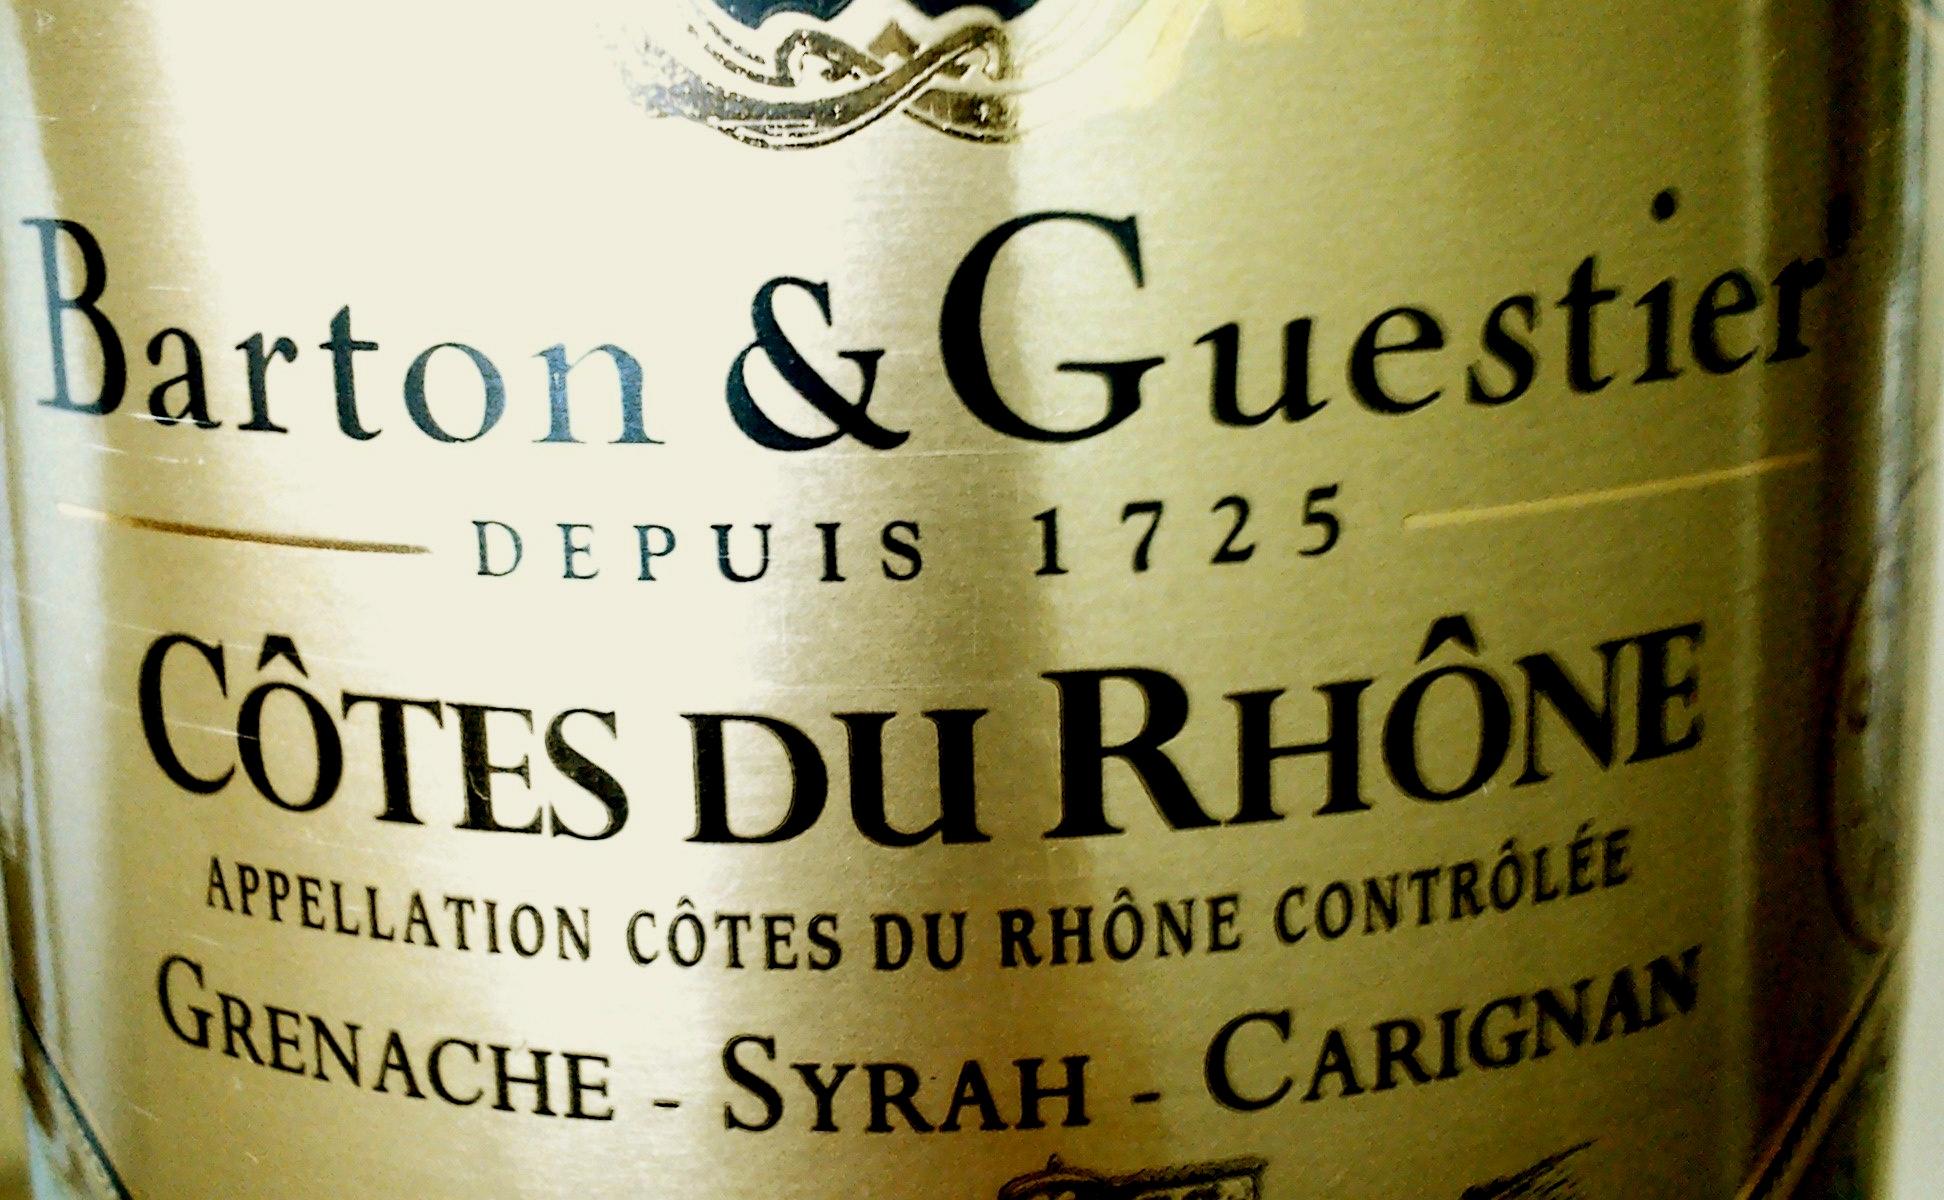 Barton & Guestier Grenache – Syrah – Carignan Côtes du Rhône 2010